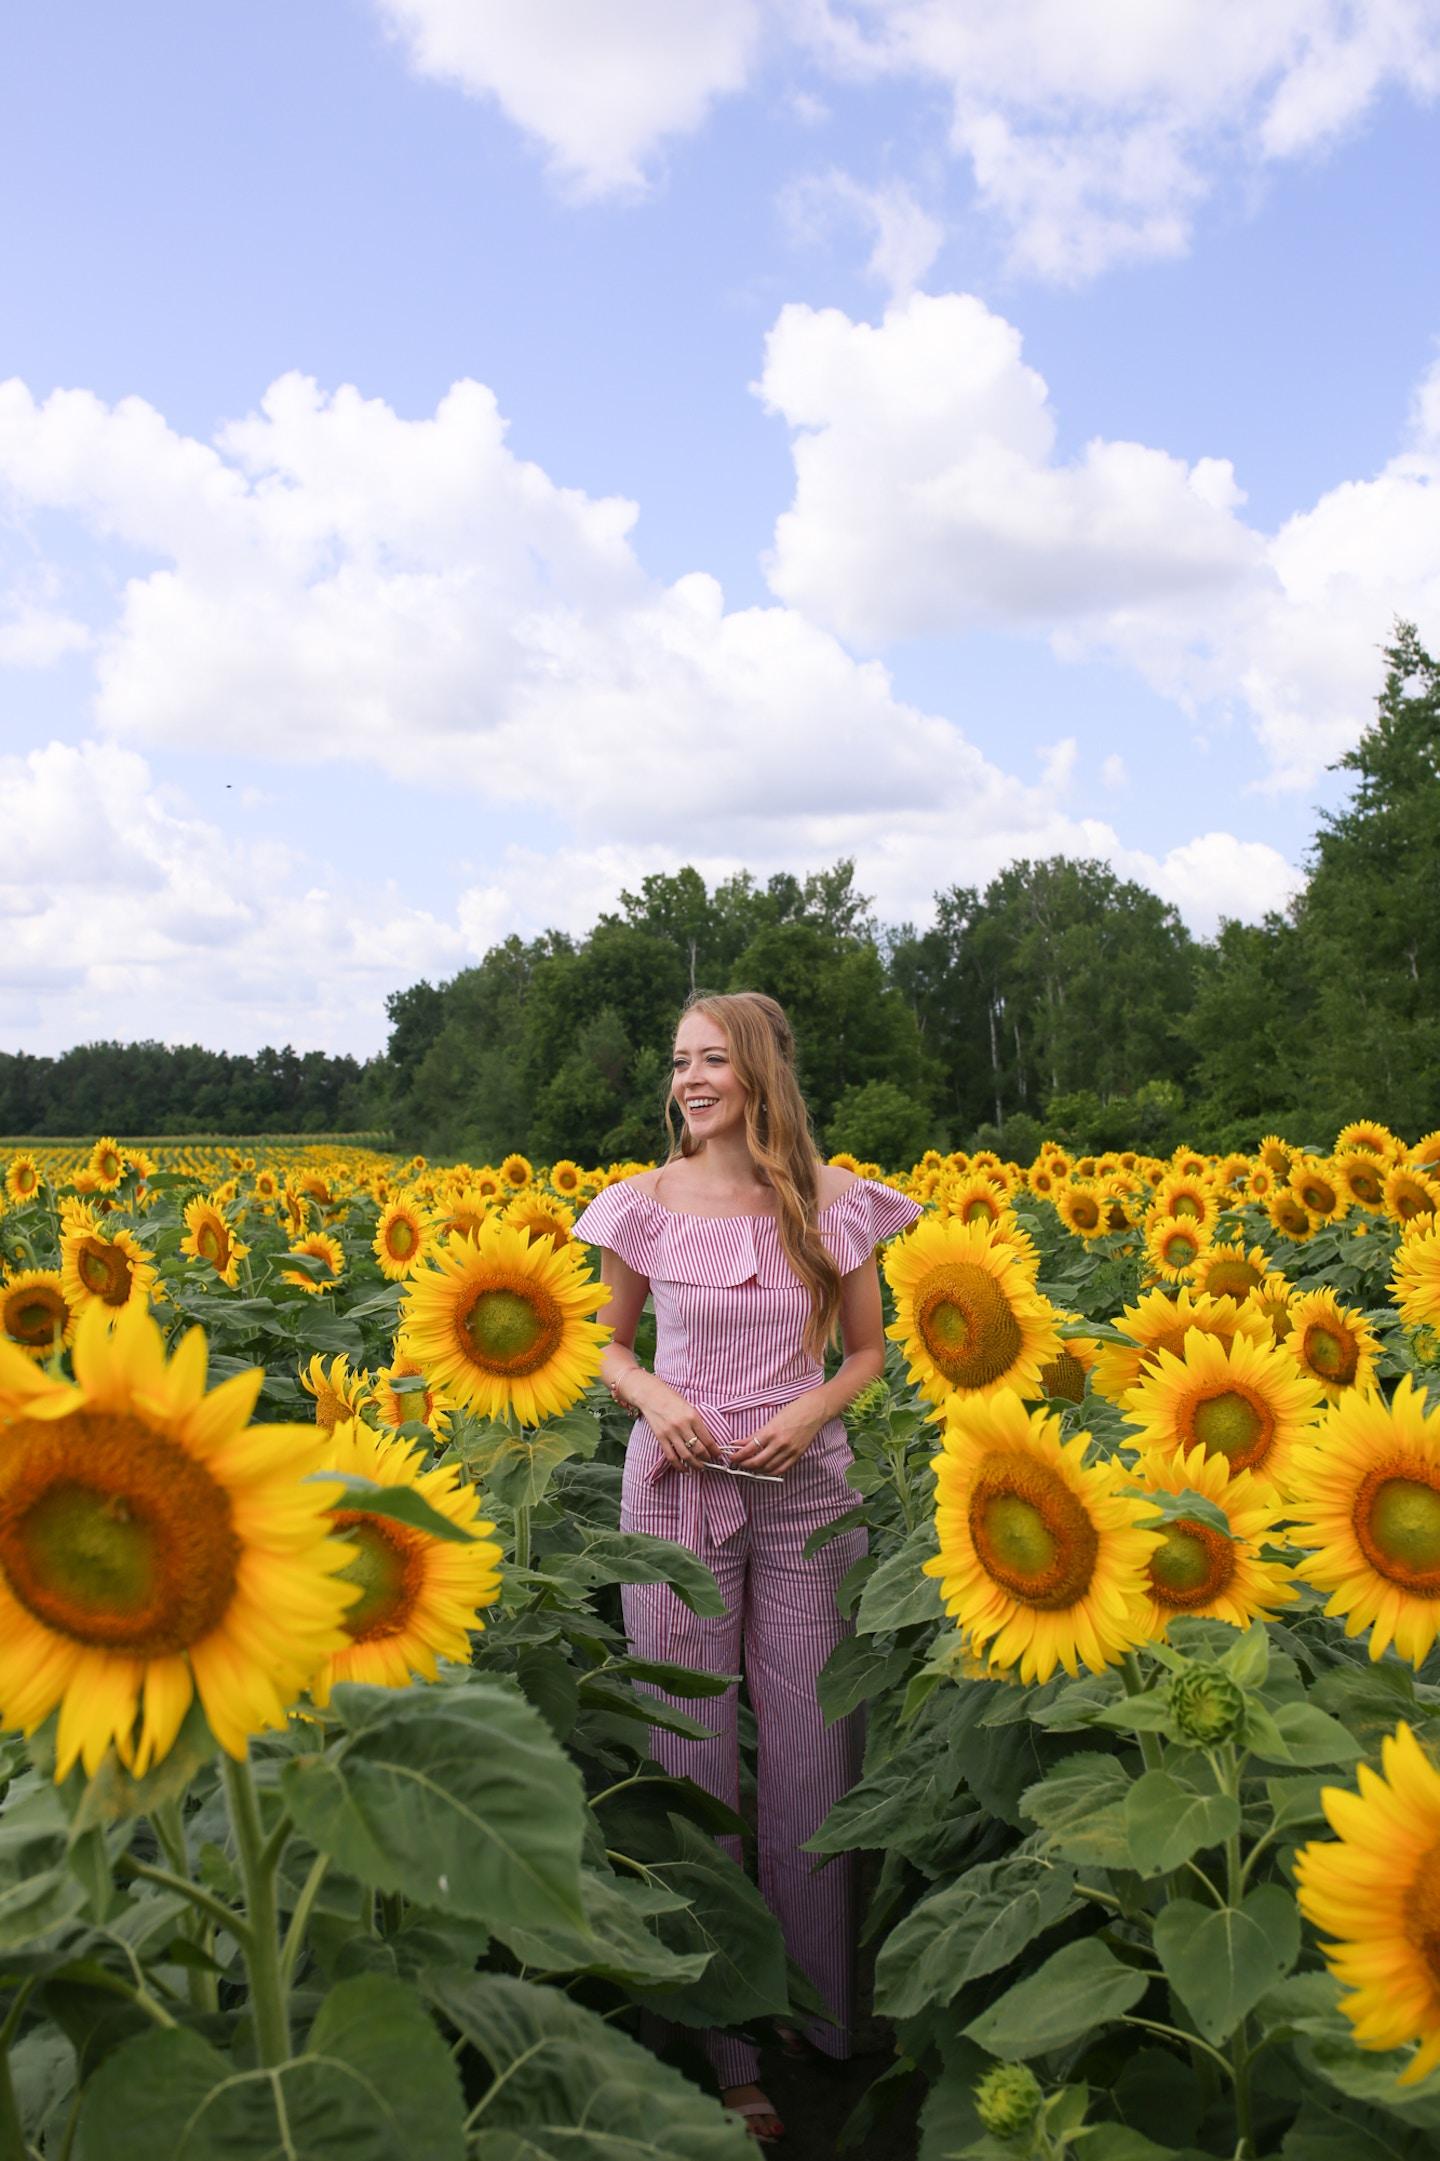 sunflower fields near toronto that are still open in august 2018